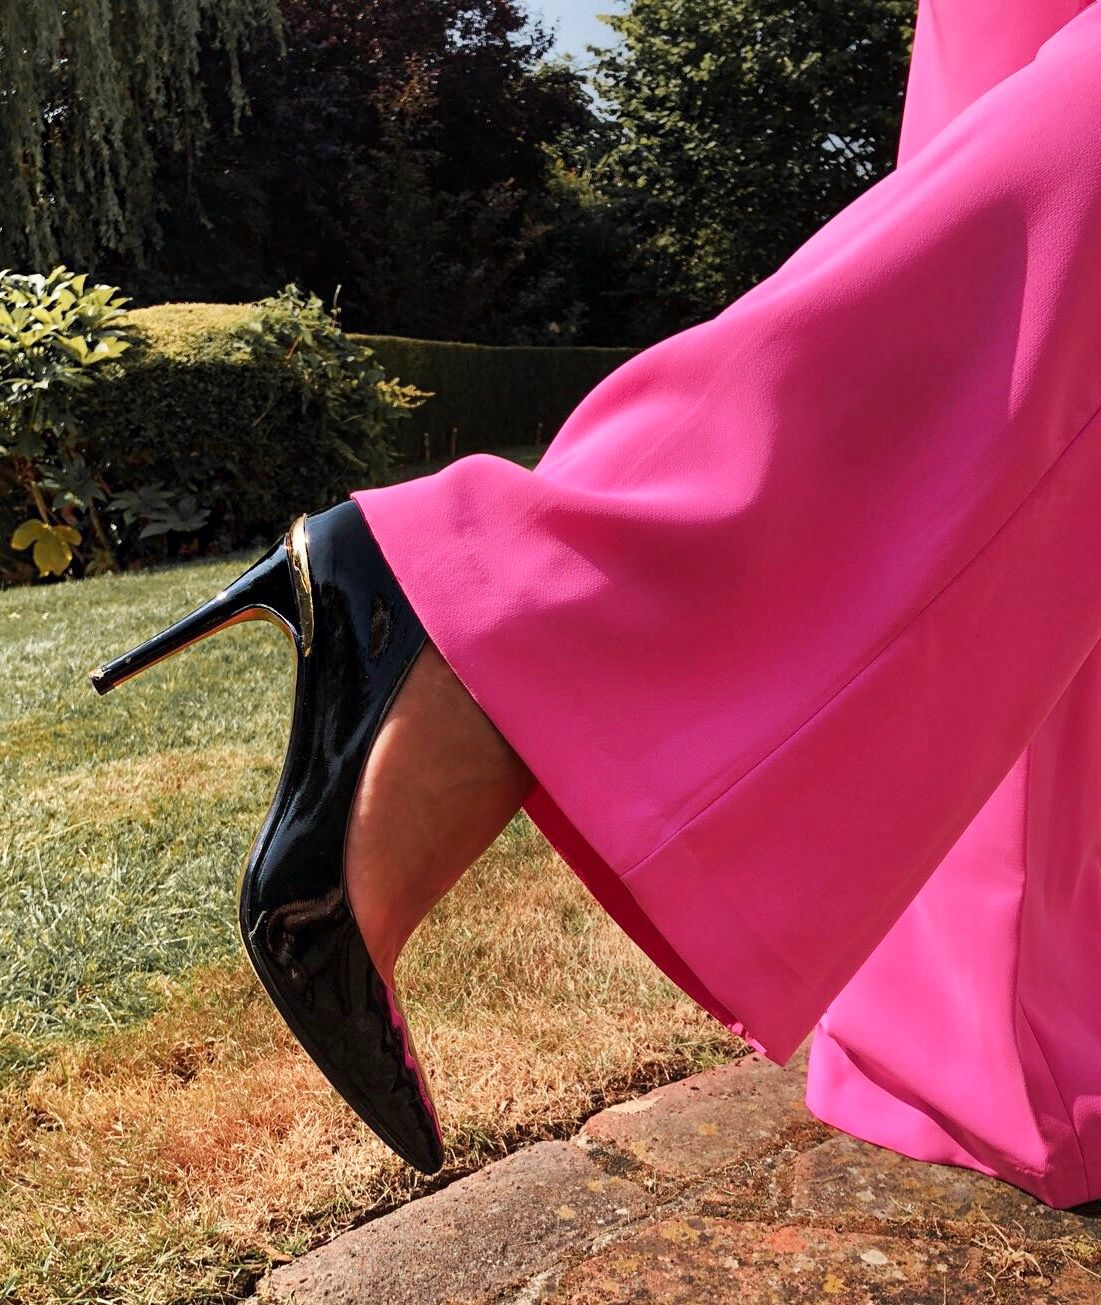 ELEGANT DUCHESS FASHION FOREVER UNIQUE LEYA - Hot Pink Tailored Suit | Swarovski hoop earrings | Ted Baker Court Shoes | Miu Miu sunglasses